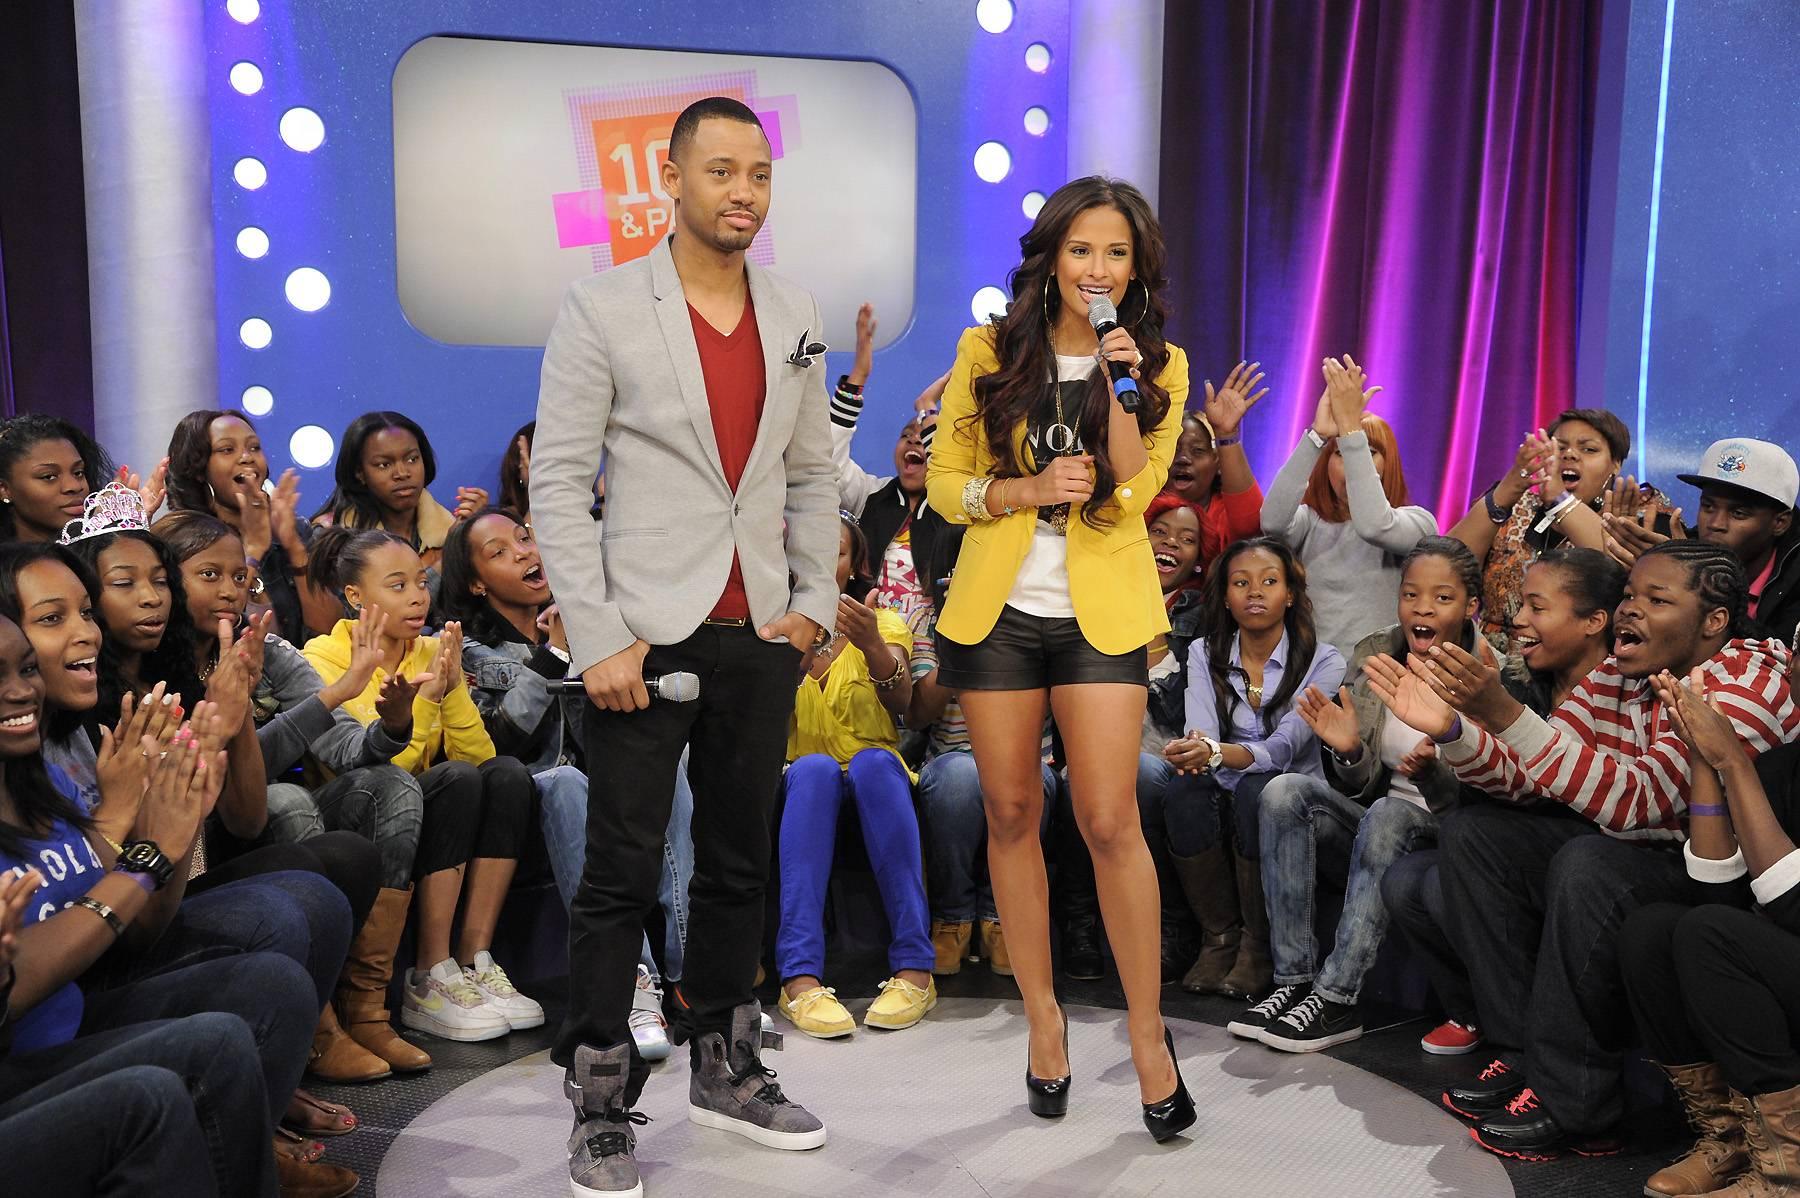 Think Like A Man - Terrence J and Rocsi Diaz at 106 & Park, April 5, 2012. (photo: John Ricard / BET)